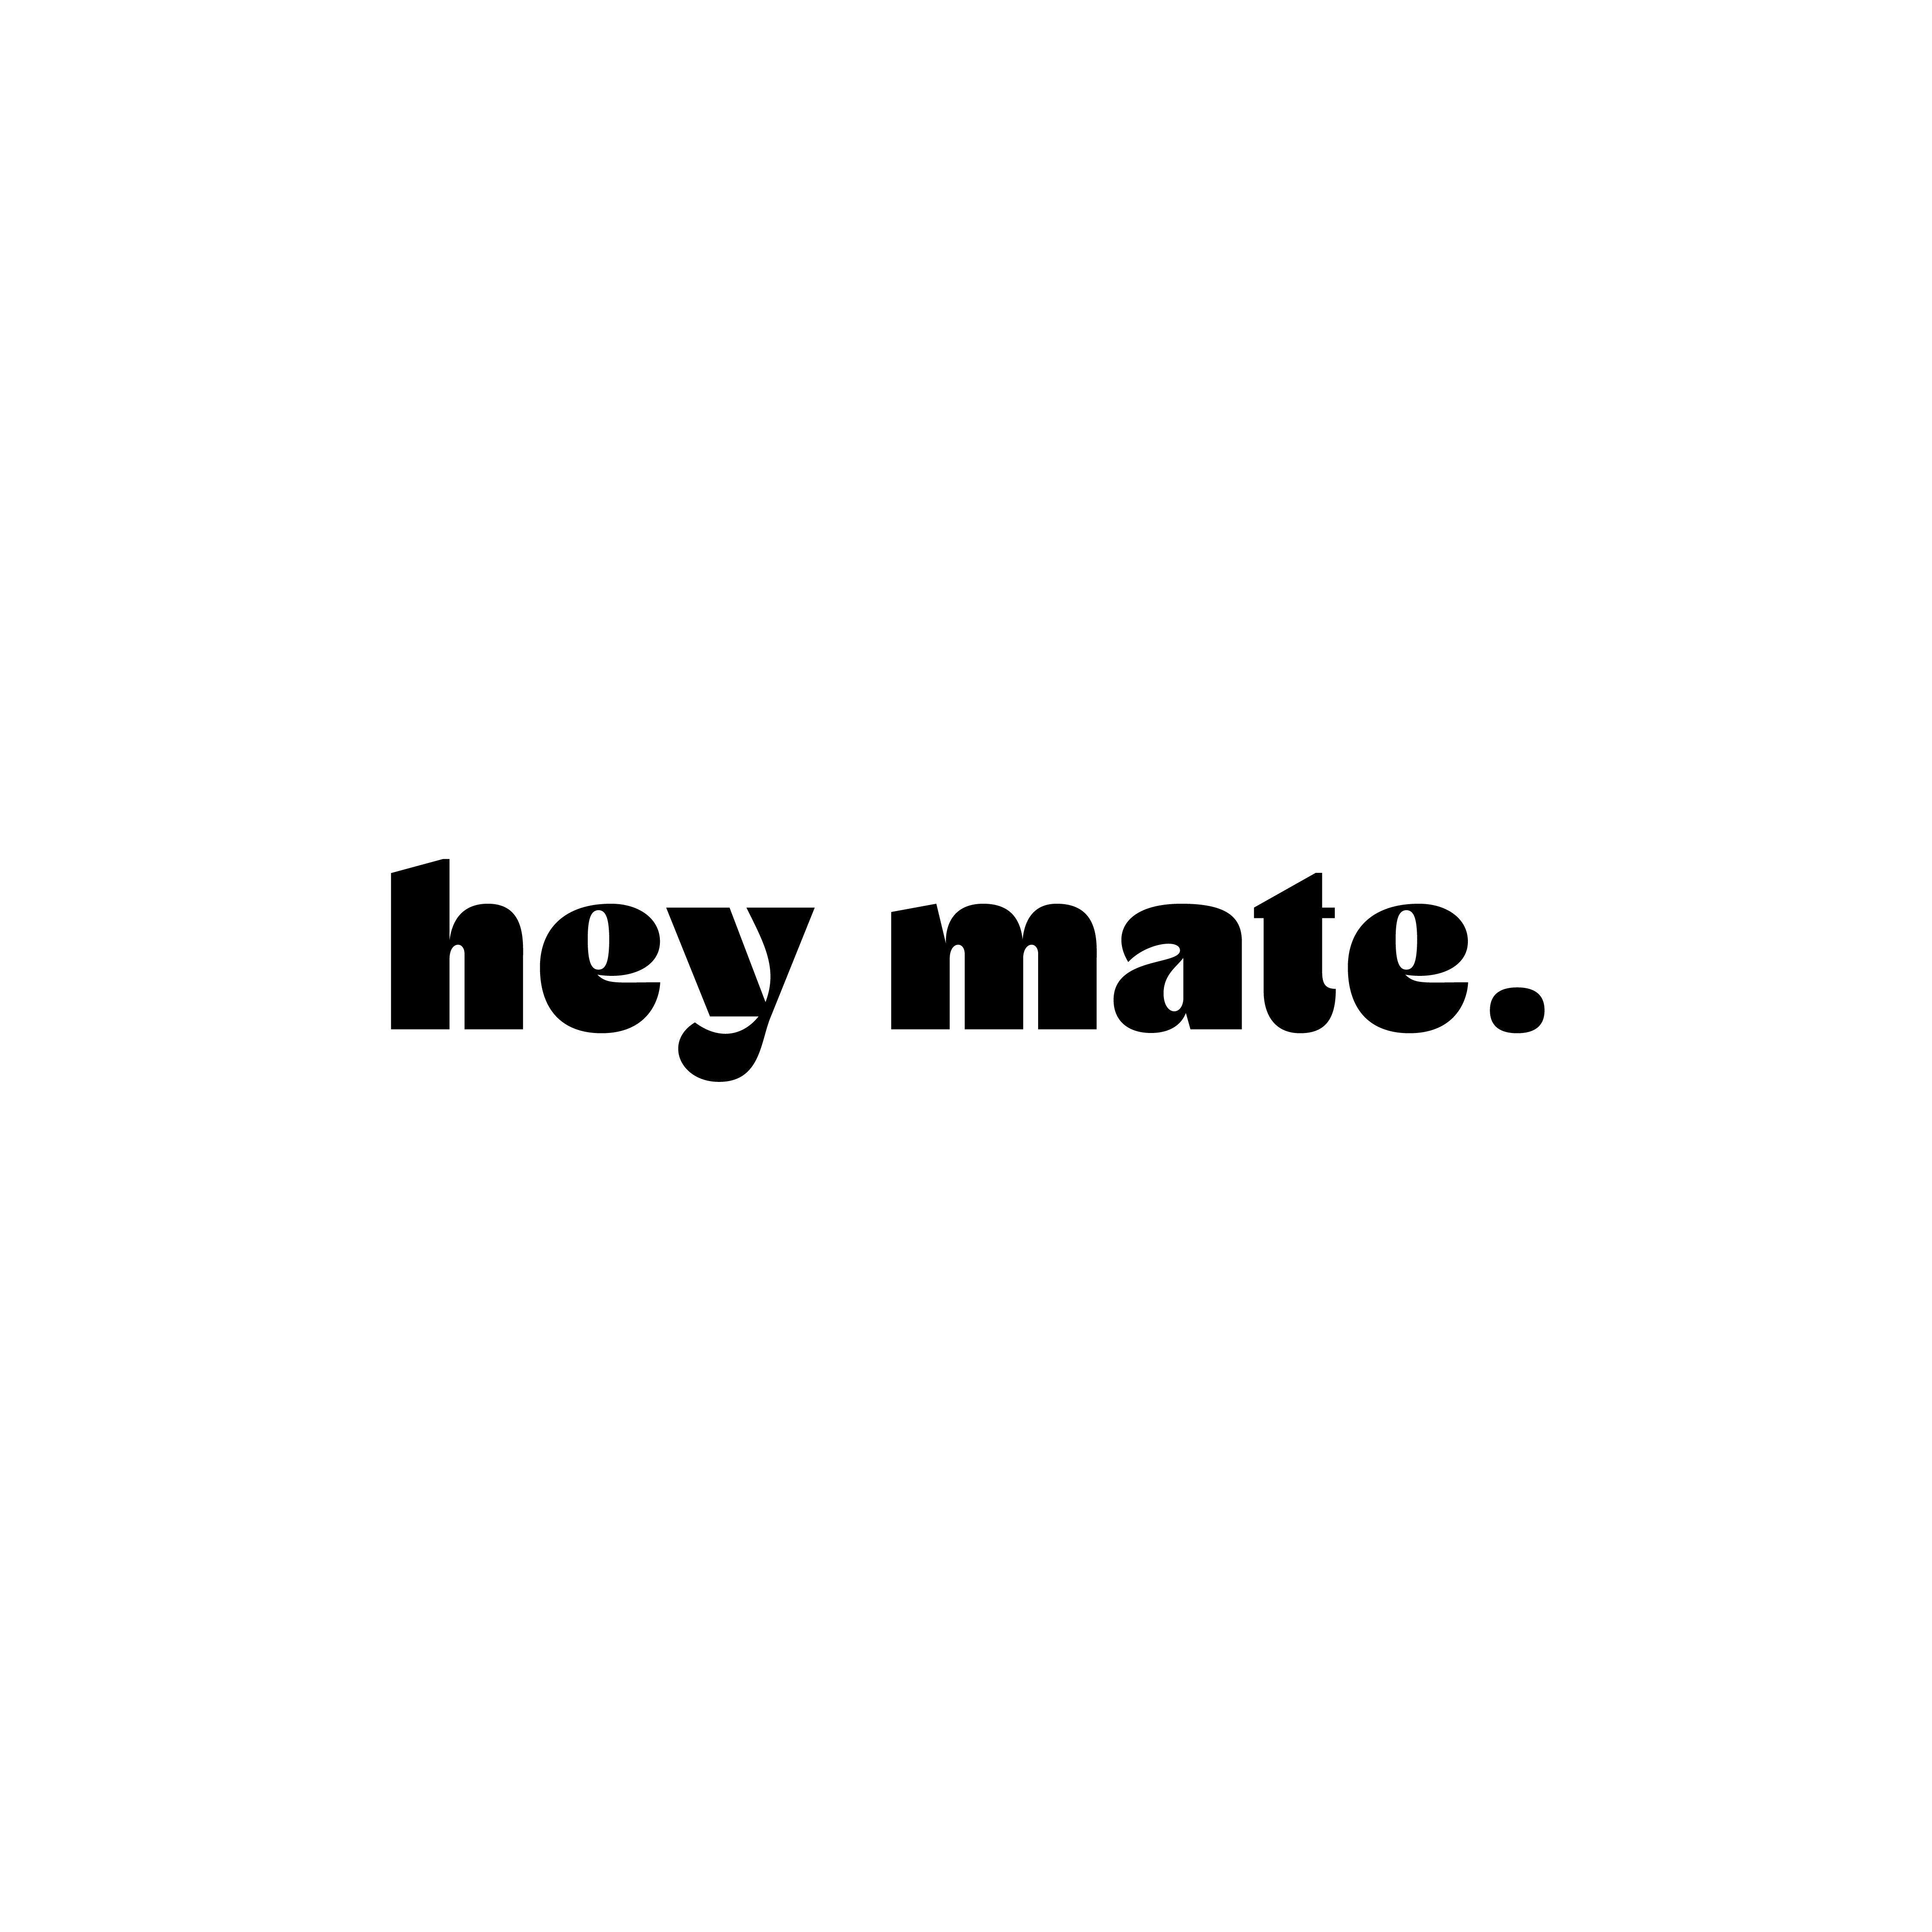 Hey Mate logo